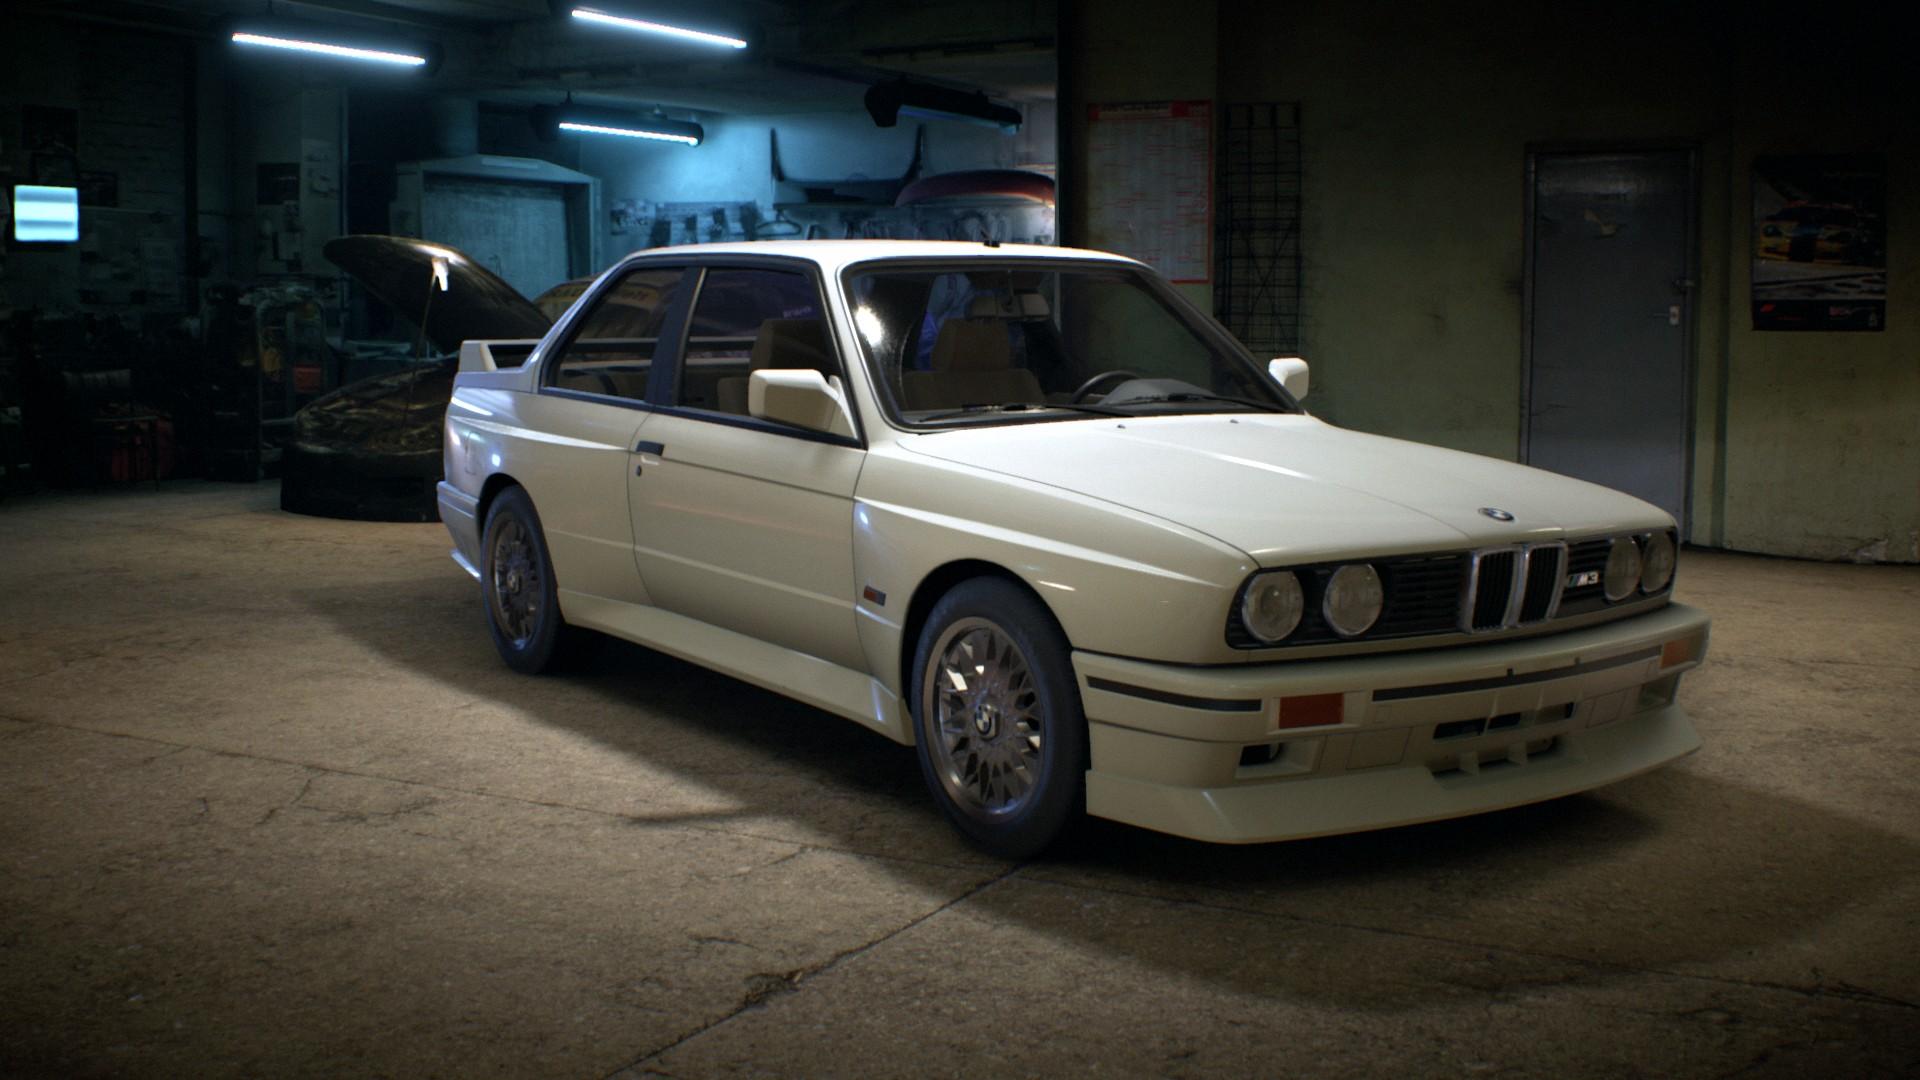 BMW M3 Evolution II (E30) | Need for Speed Wiki | FANDOM powered by ...